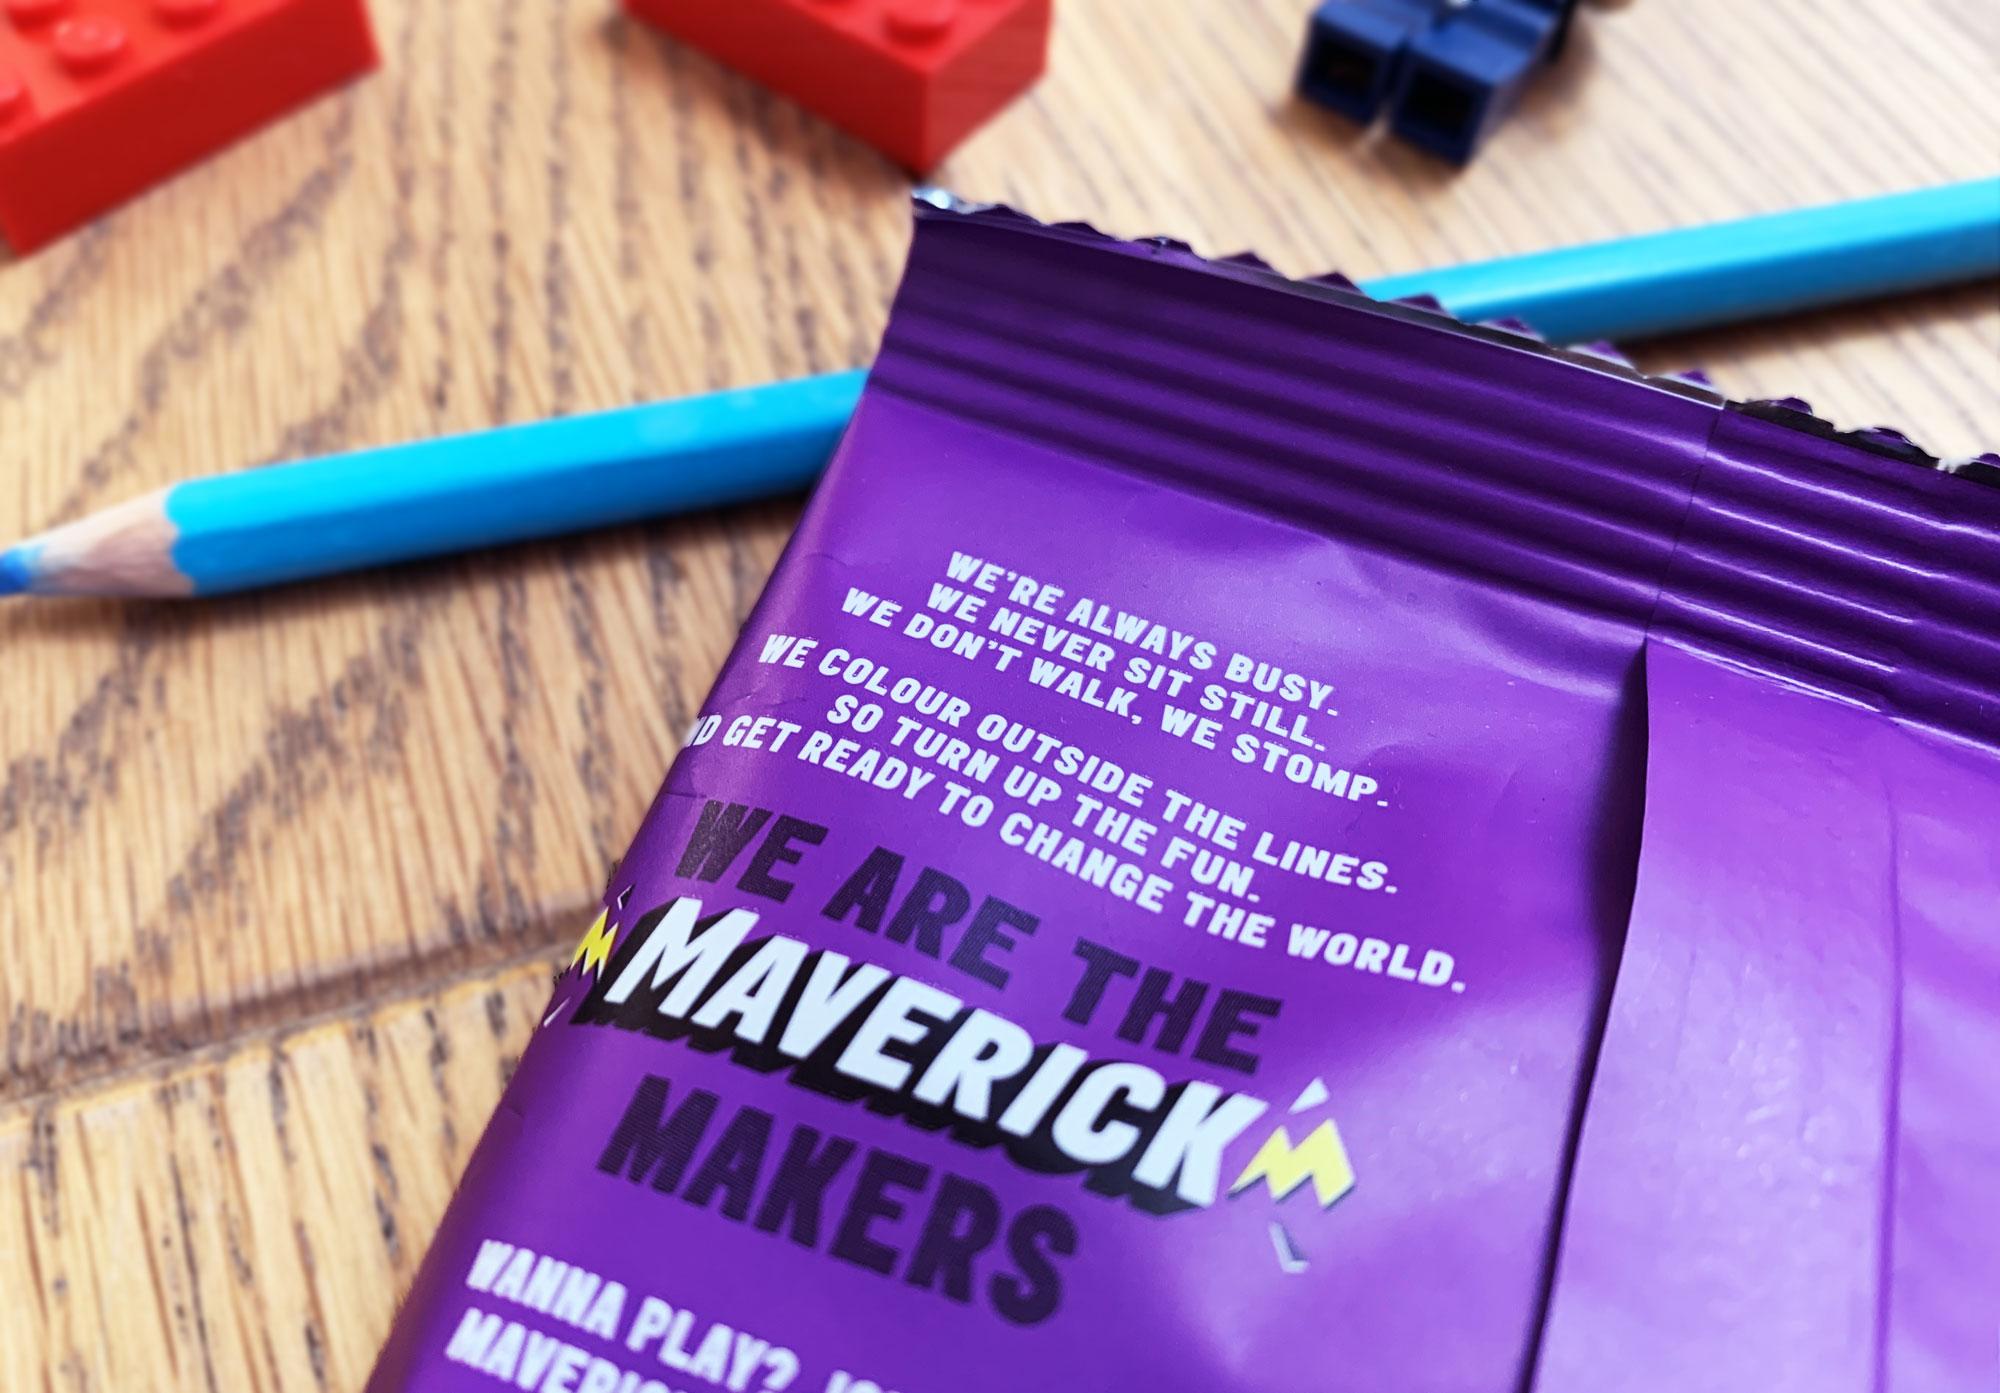 Mavericks Snacks tone of voice